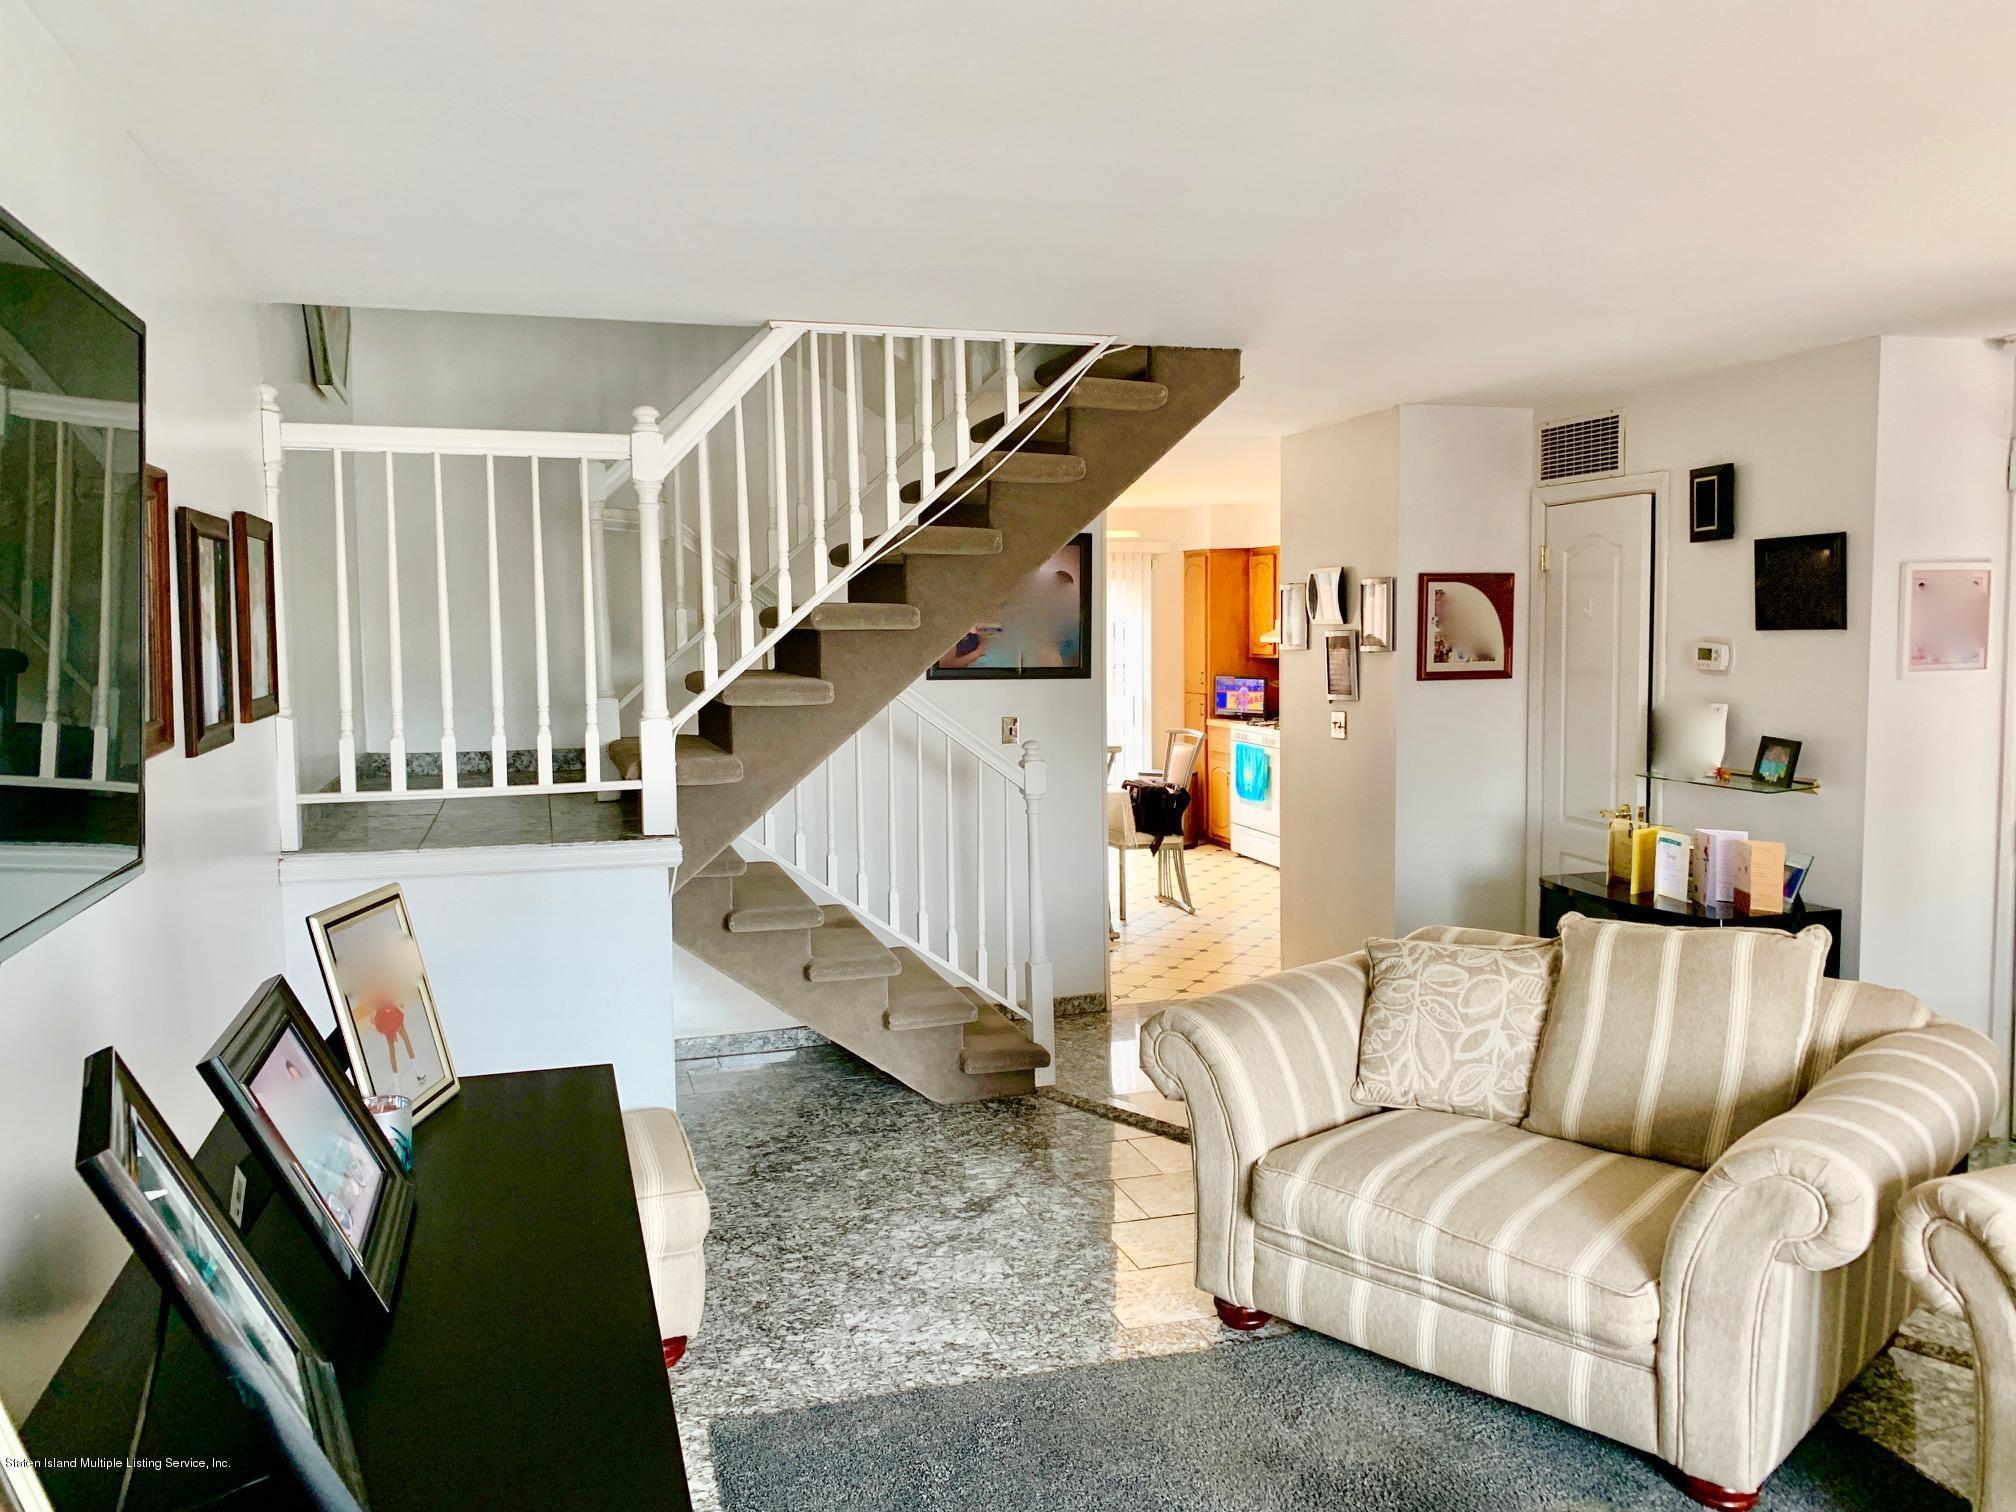 Single Family - Attached 99 Cedar Grove   Staten Island, NY 10306, MLS-1132231-10